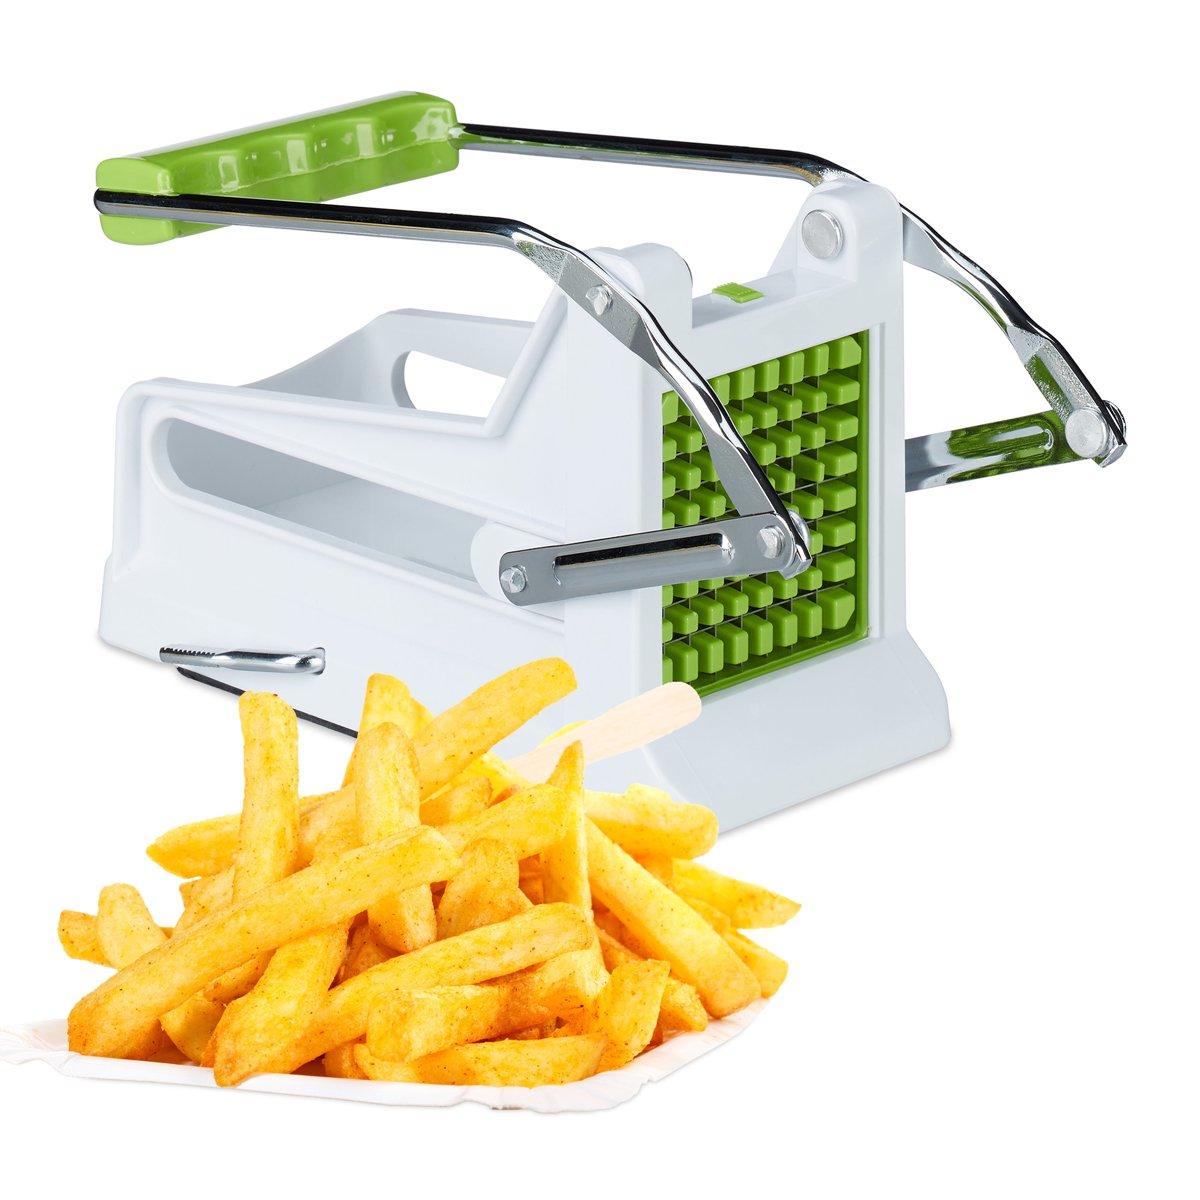 relaxdays frietsnijder - handmatig - patatsnijder - groentesnijder - 2 messenramen - groen kopen